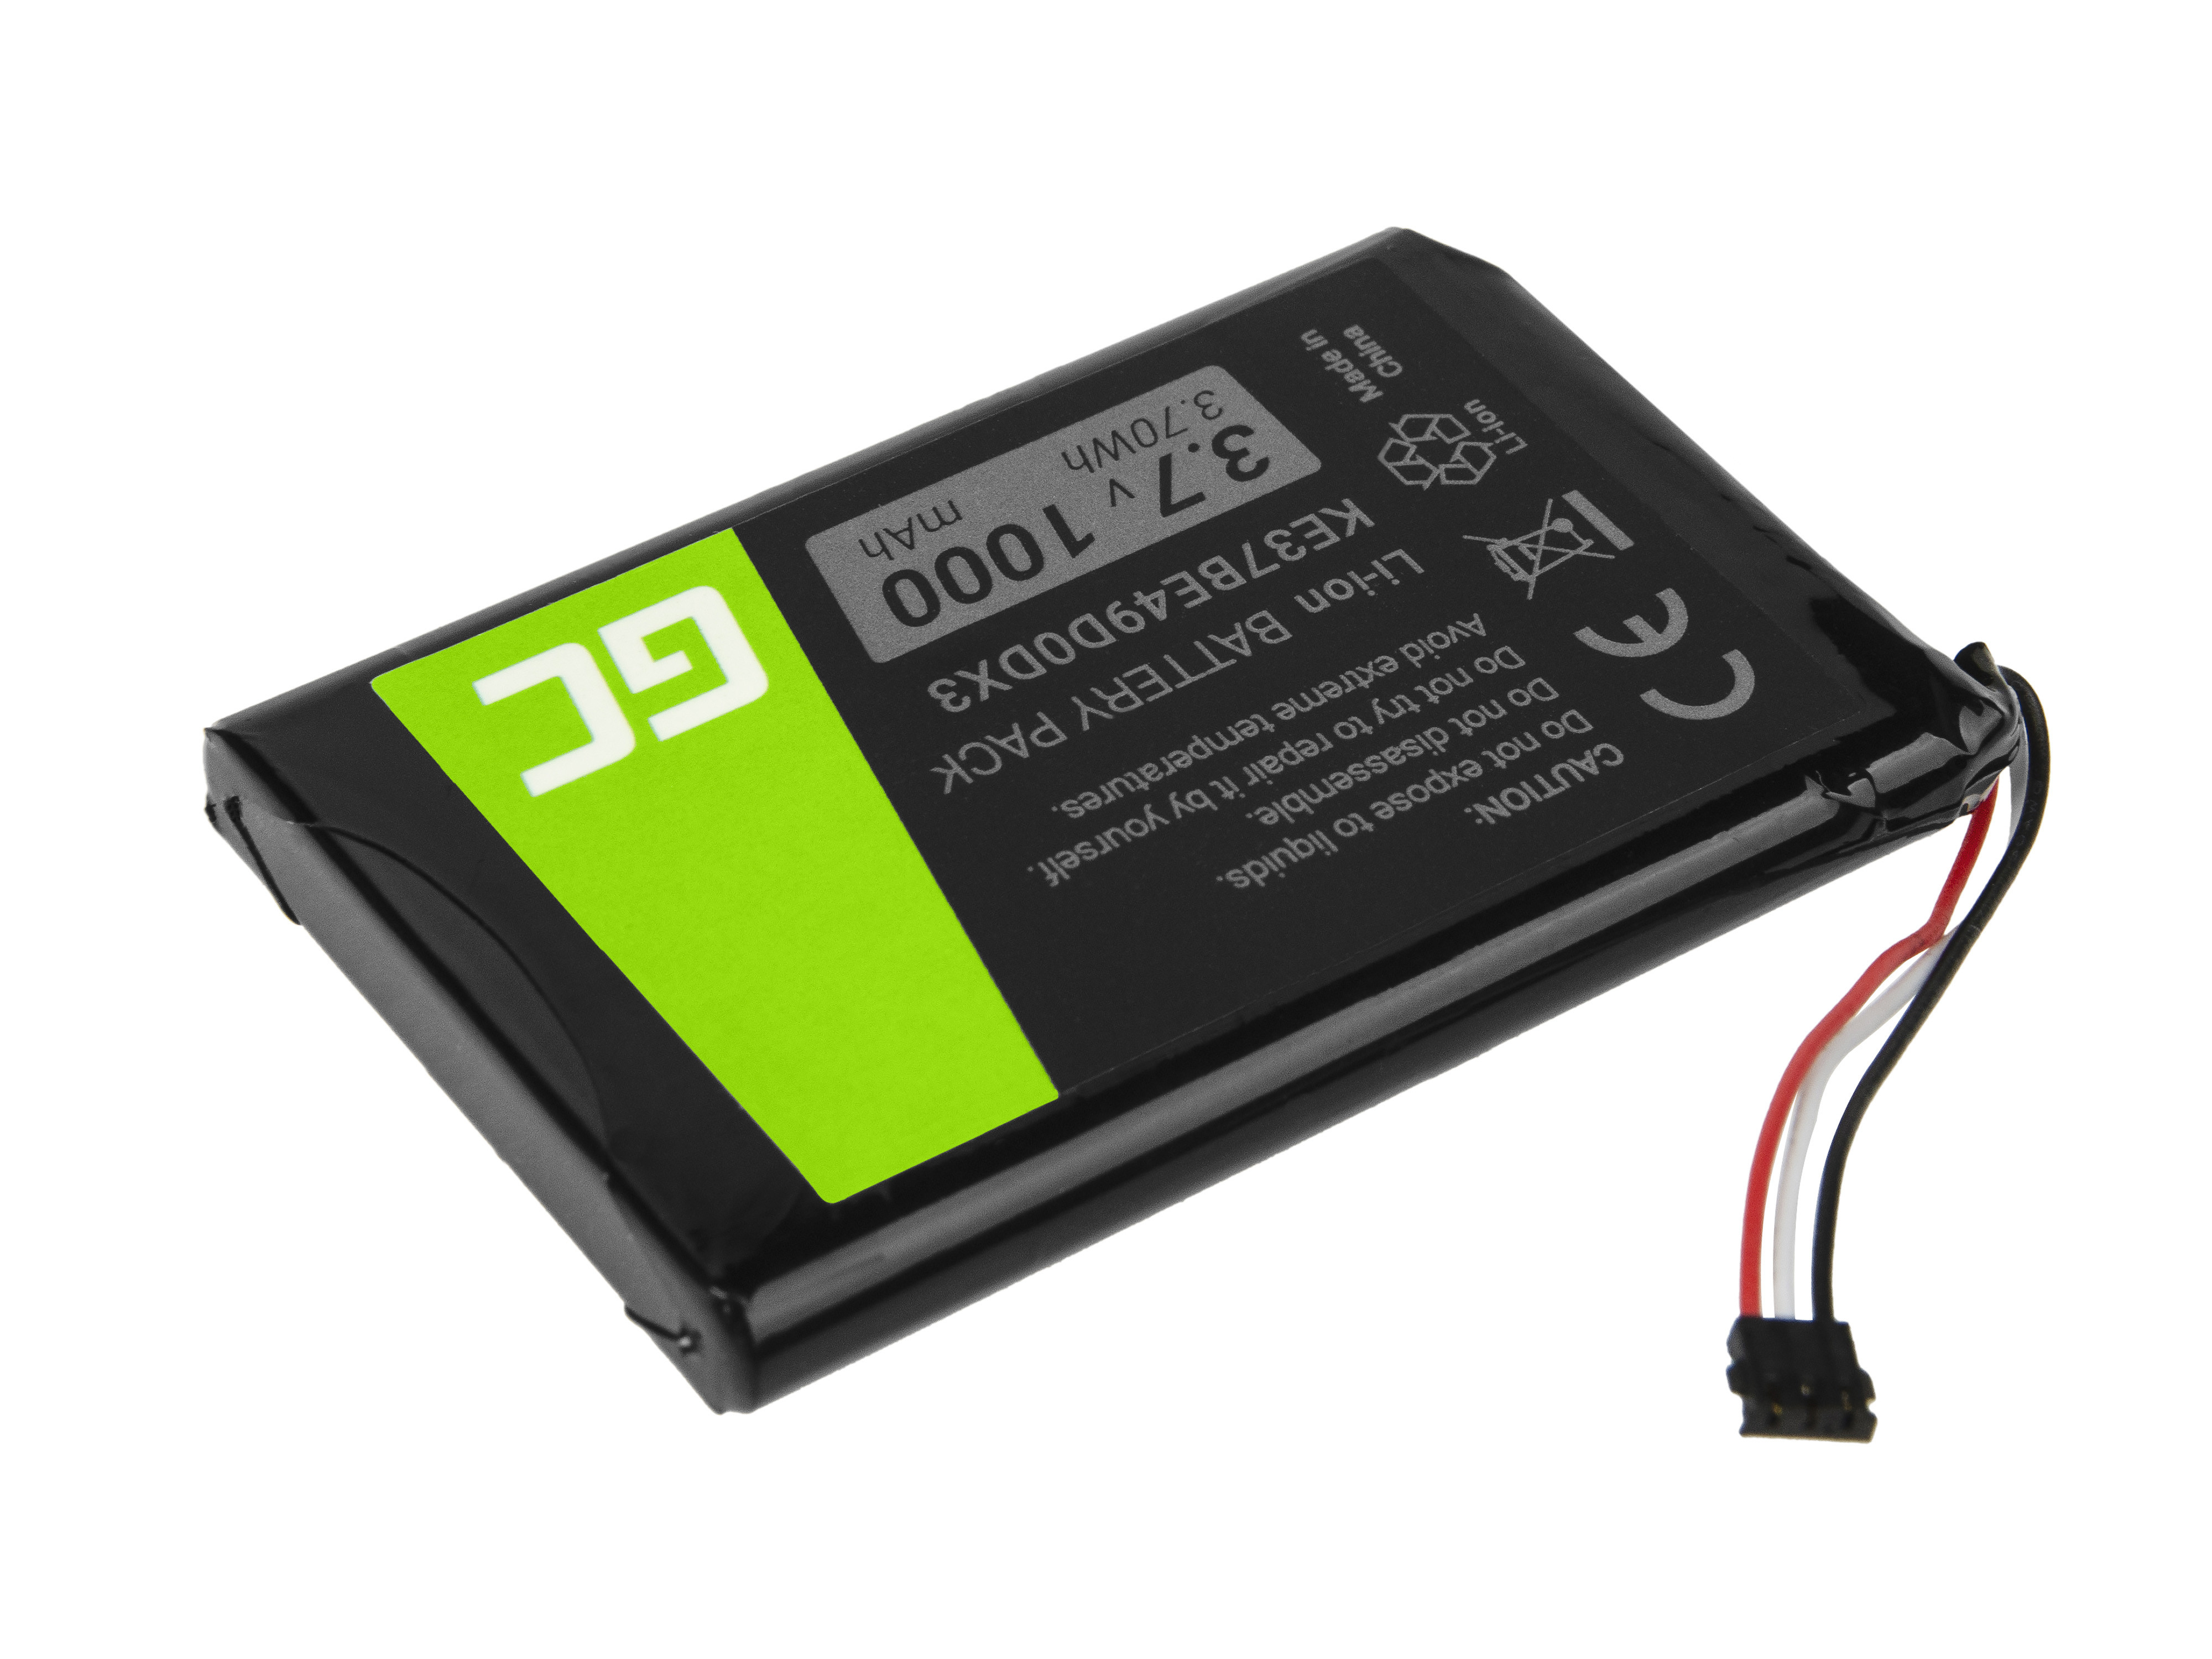 Green Cell GPS Baterie KE37BE49D0DX3 361-00035-00 Garmin Edge 800 810 Nuvi 1200 2300 2595LM